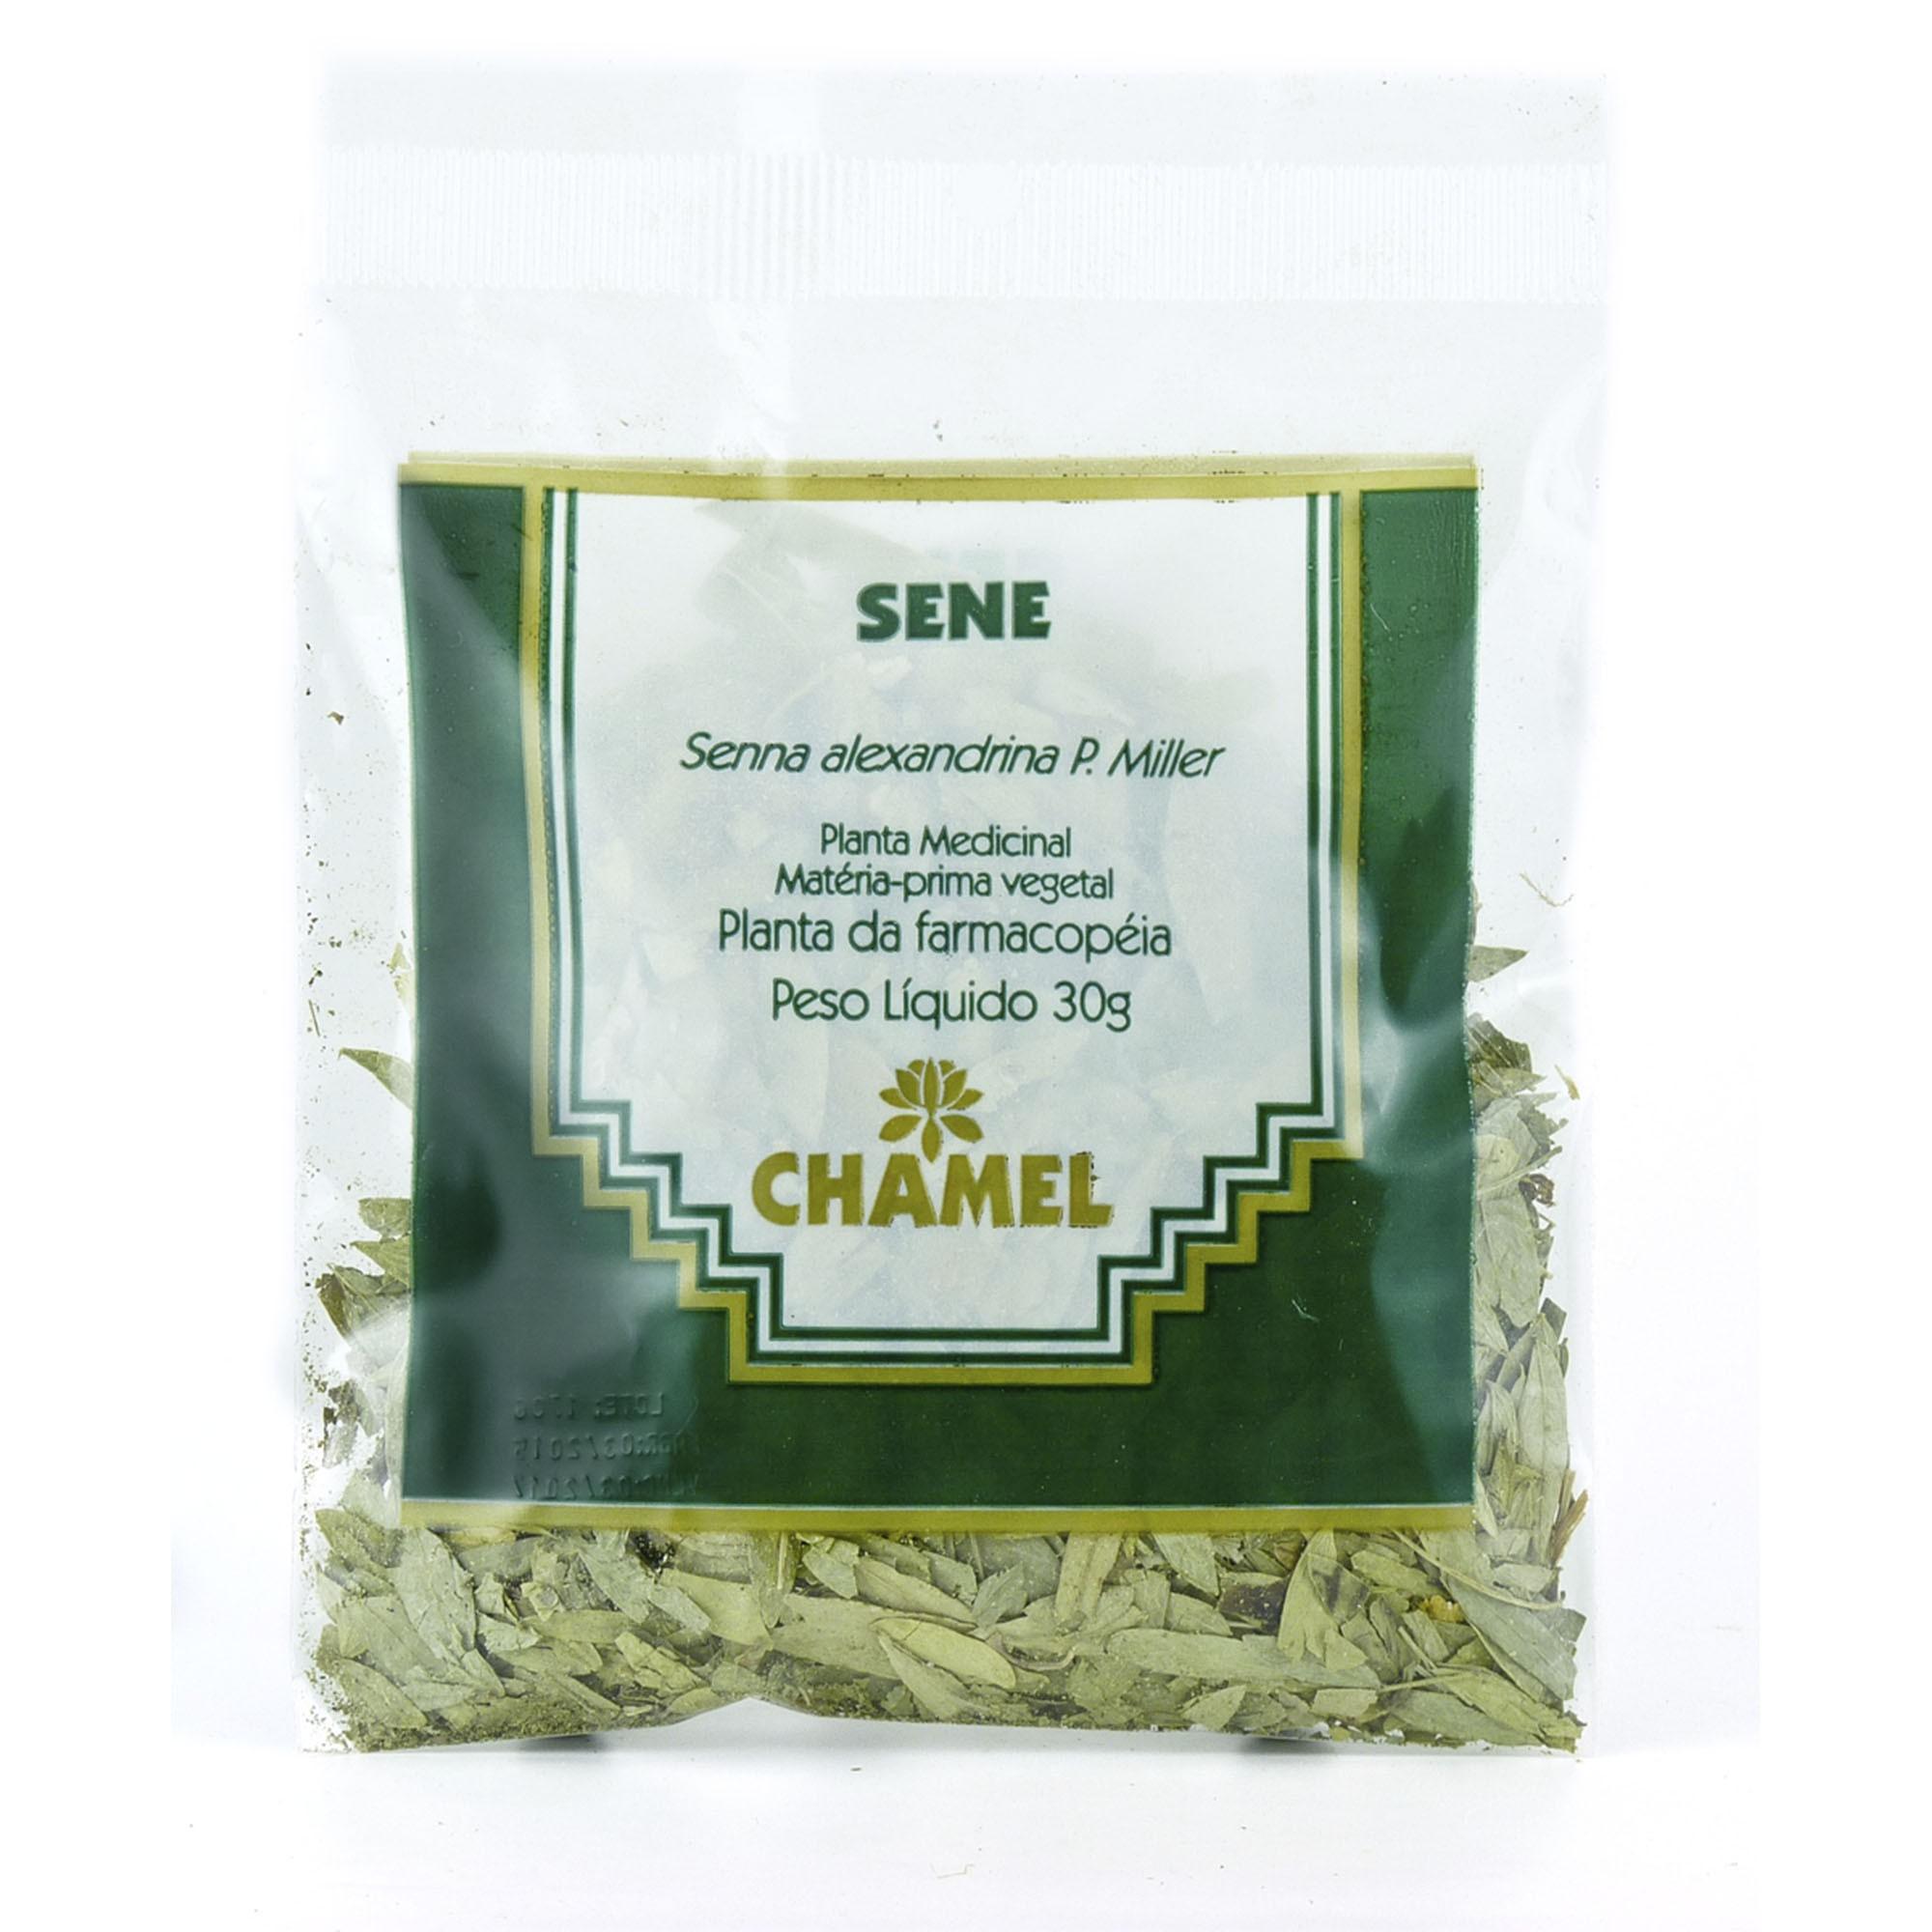 Sene  30g Chamel - Chá-Folhas